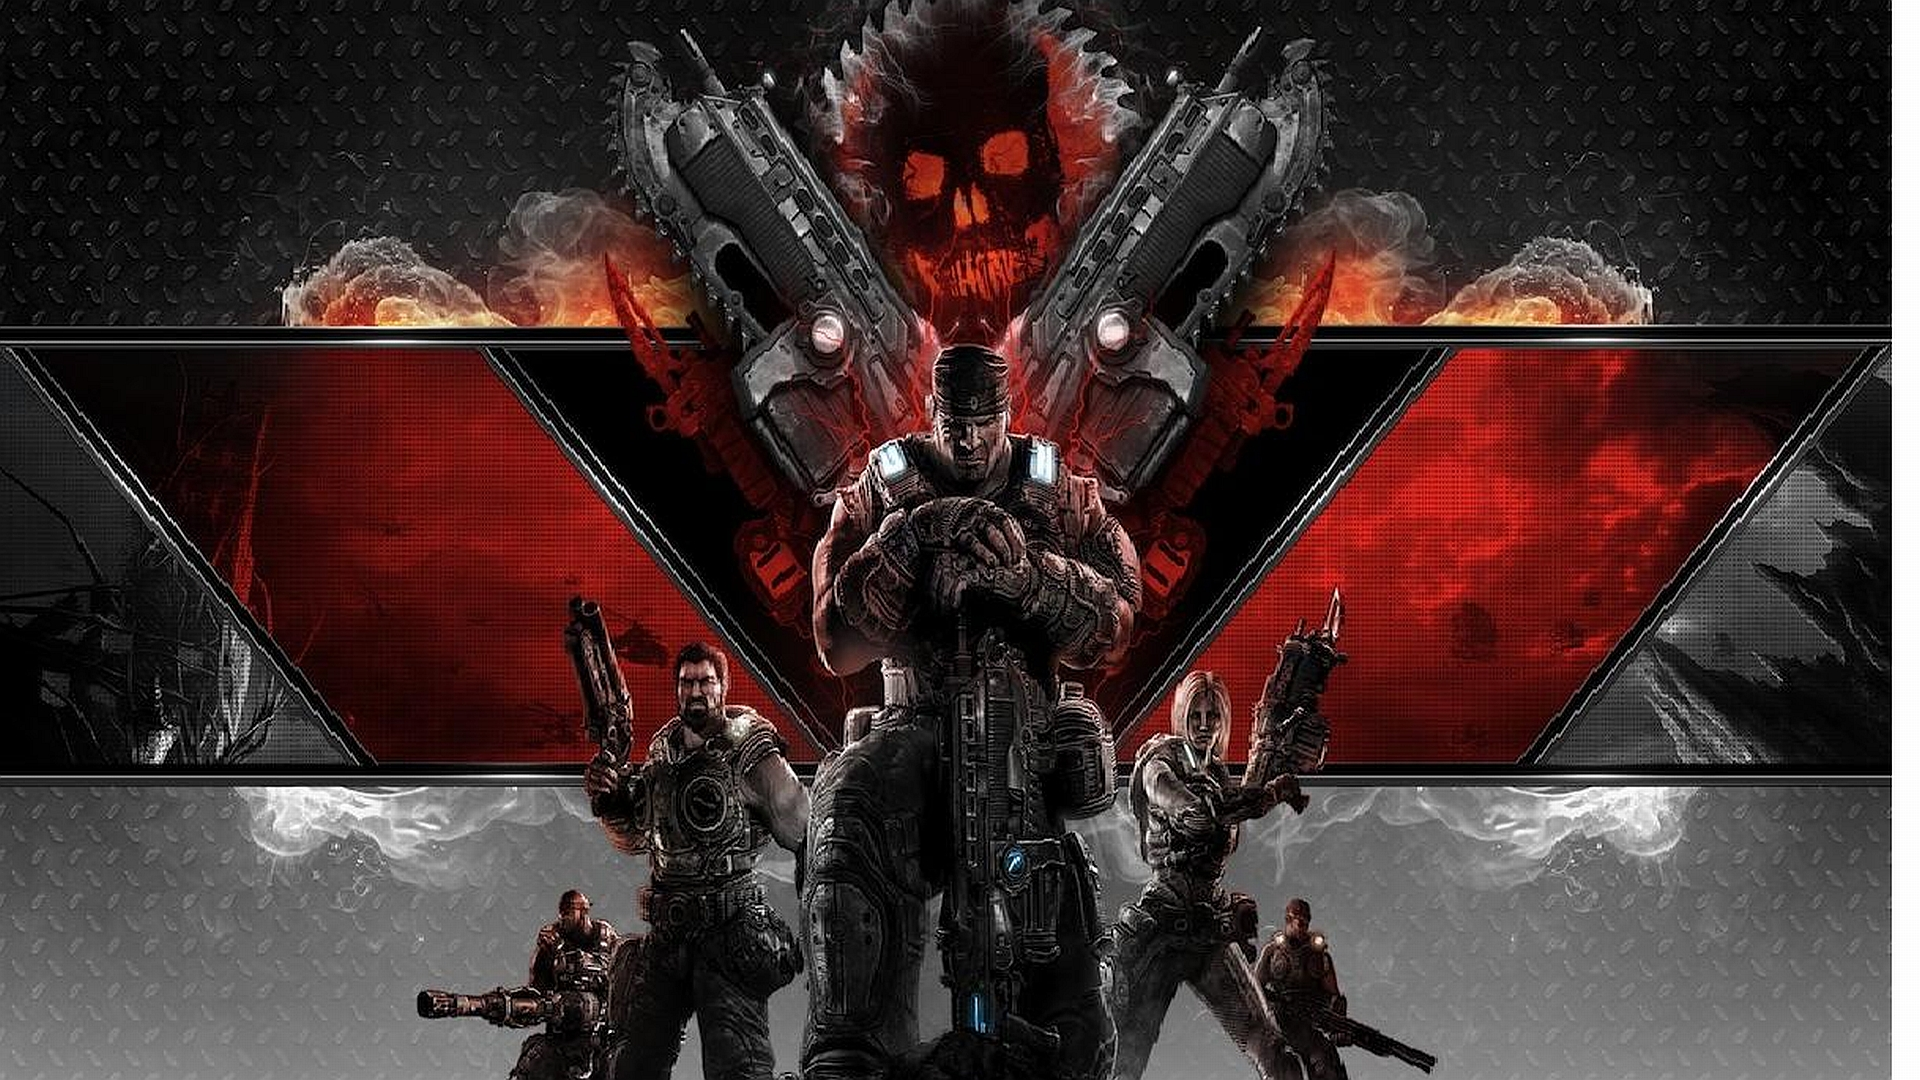 Gears Of War Wallpaper